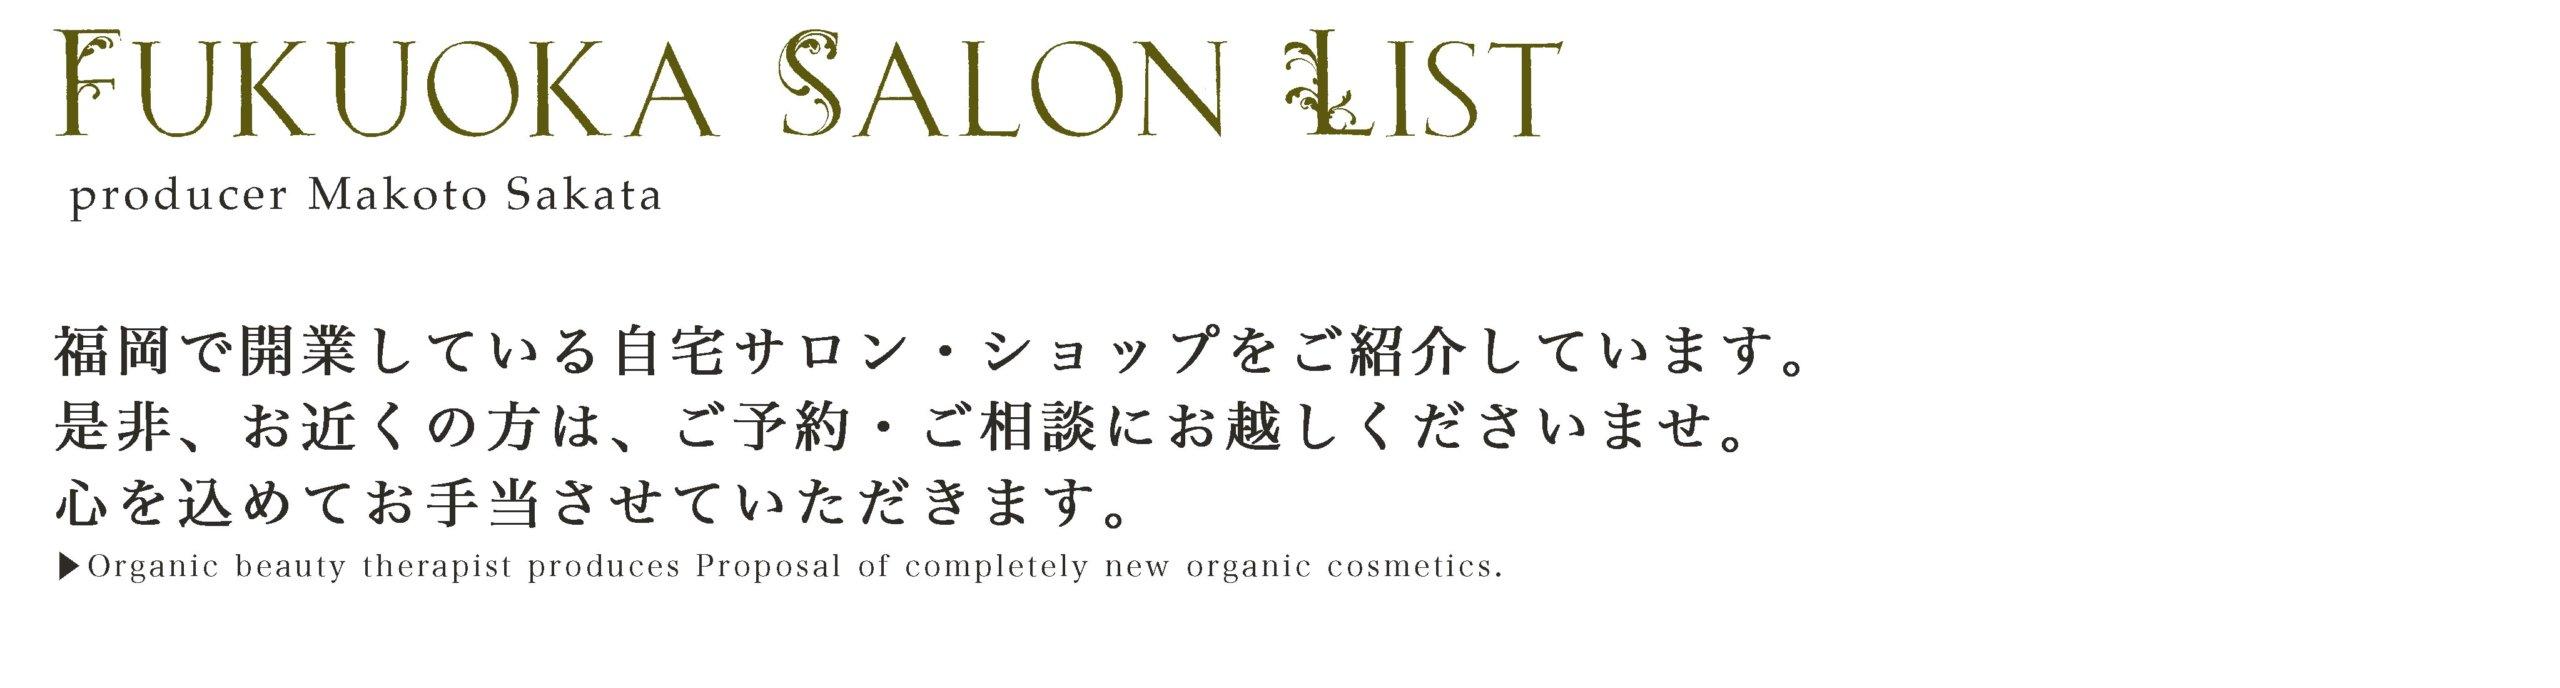 Fukuoka Salon List